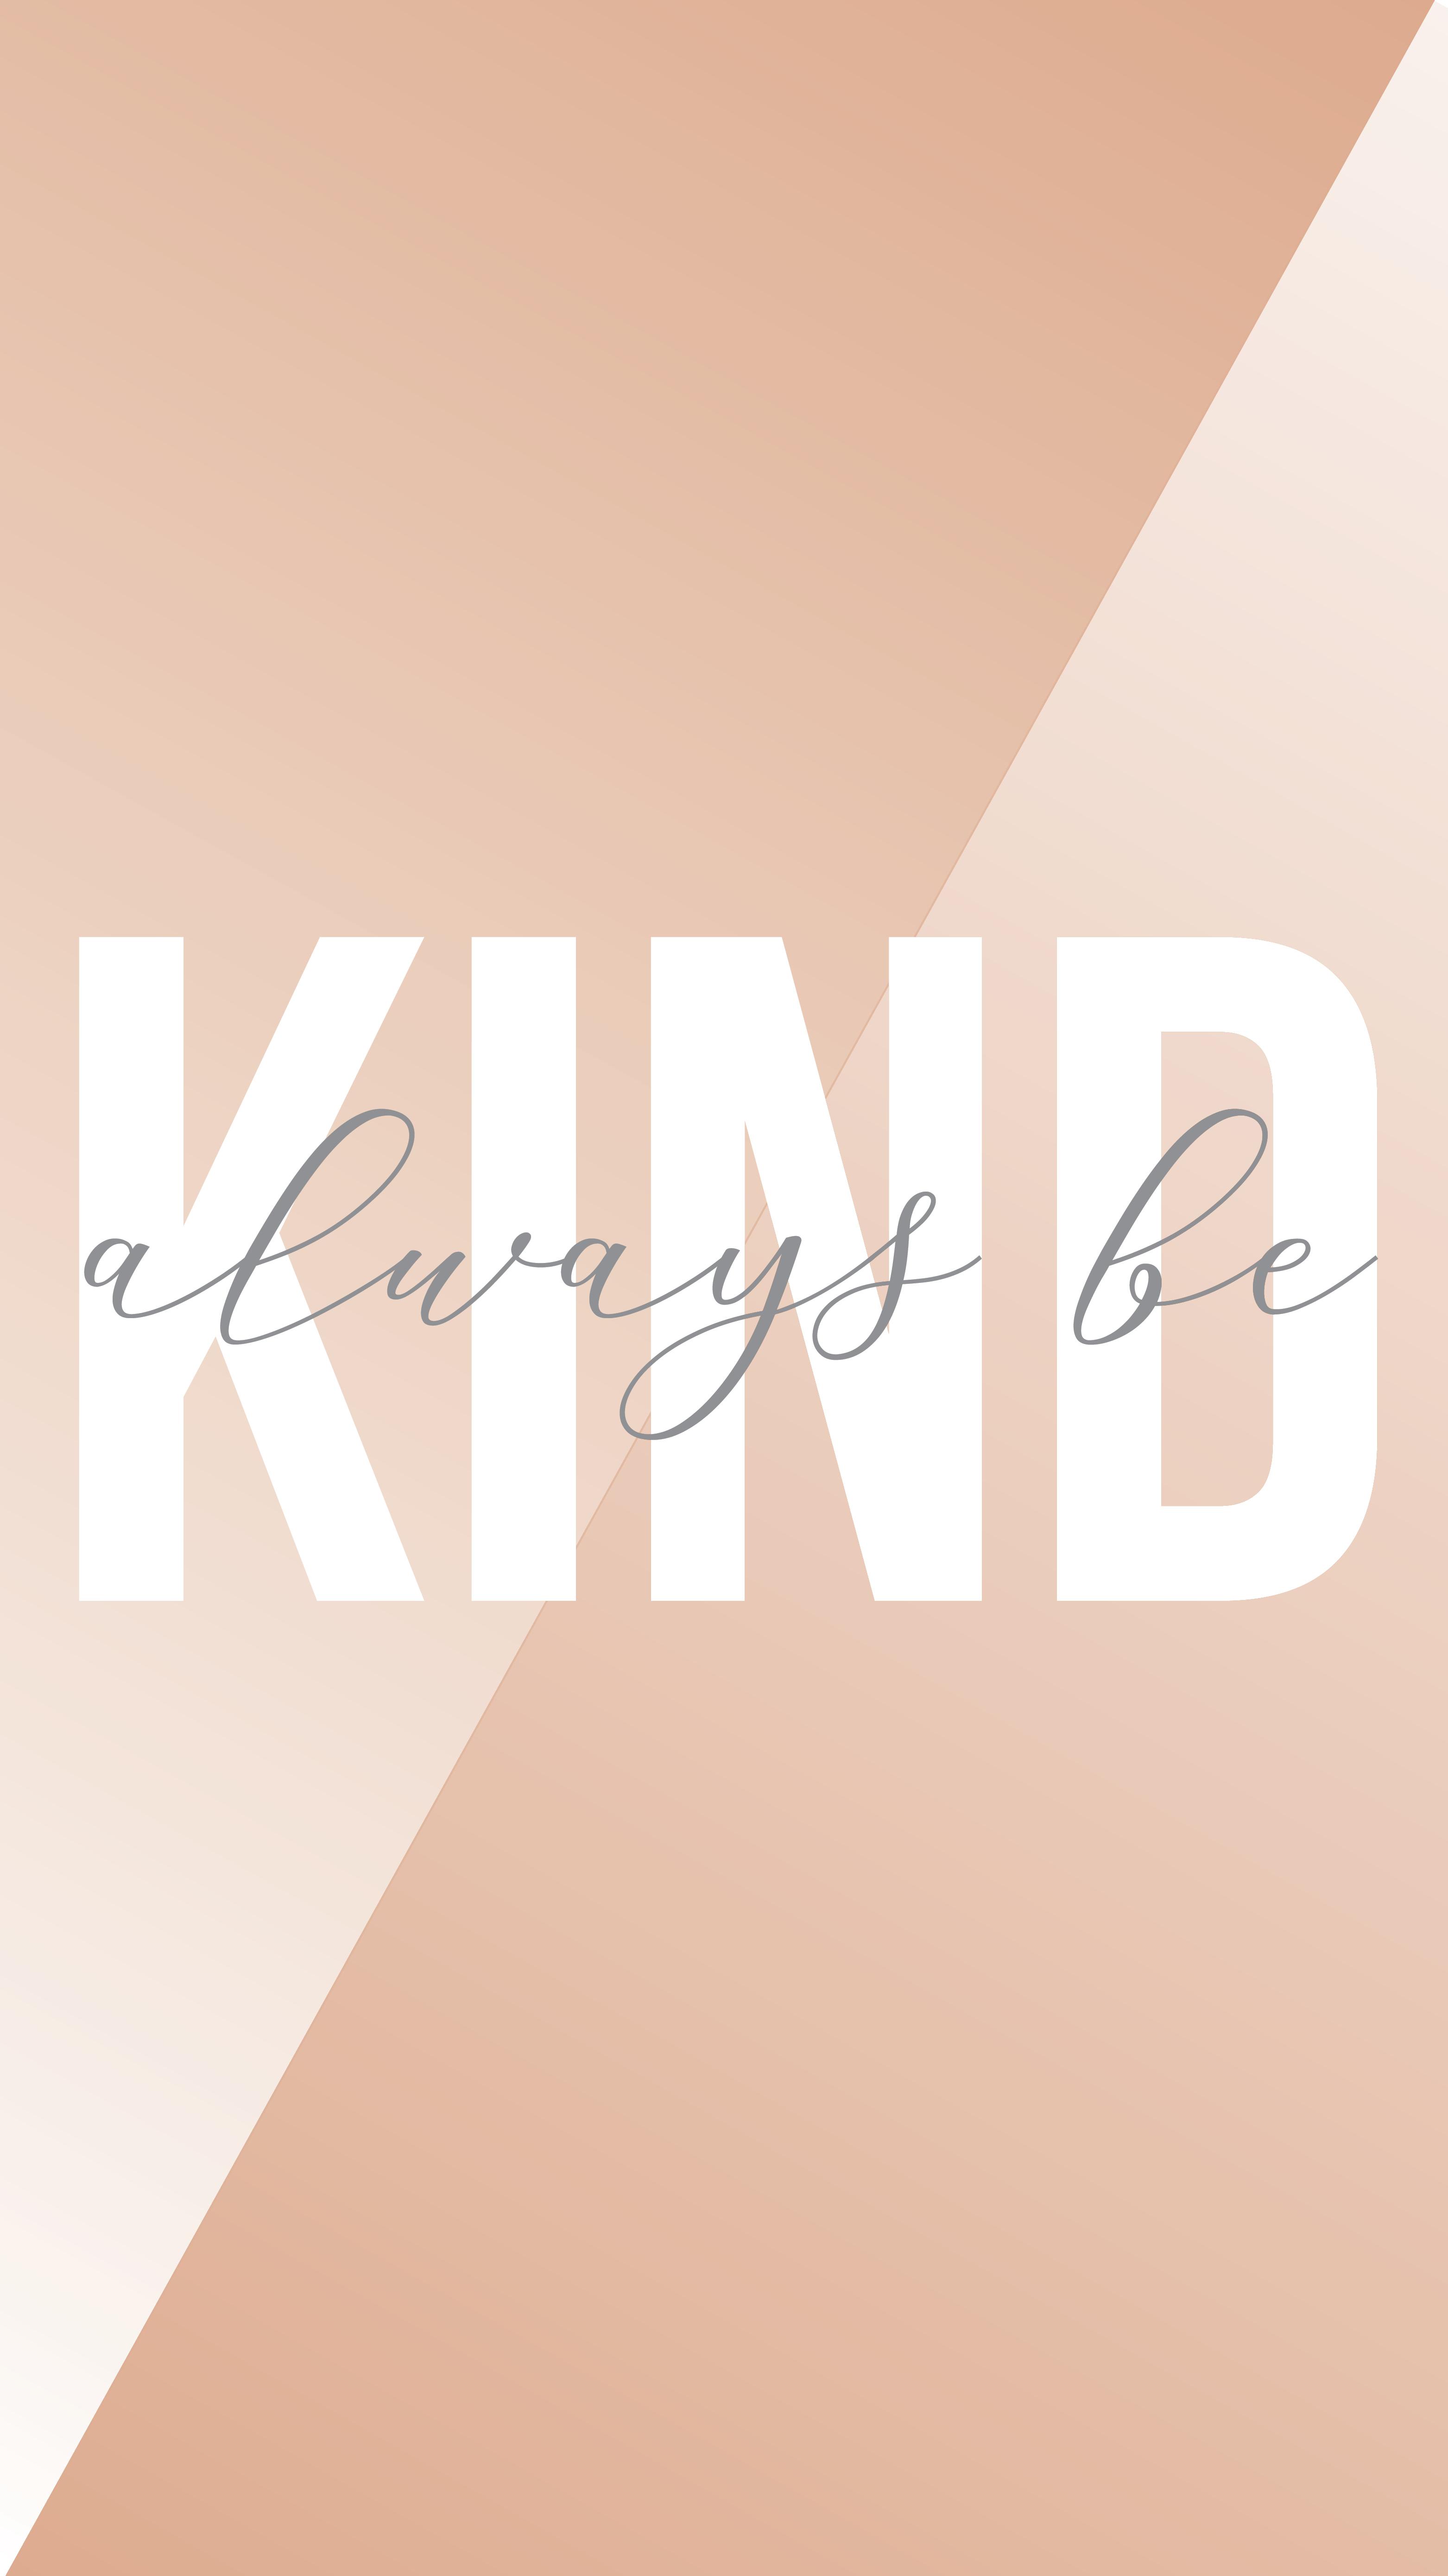 always be kind - phone wallpaper